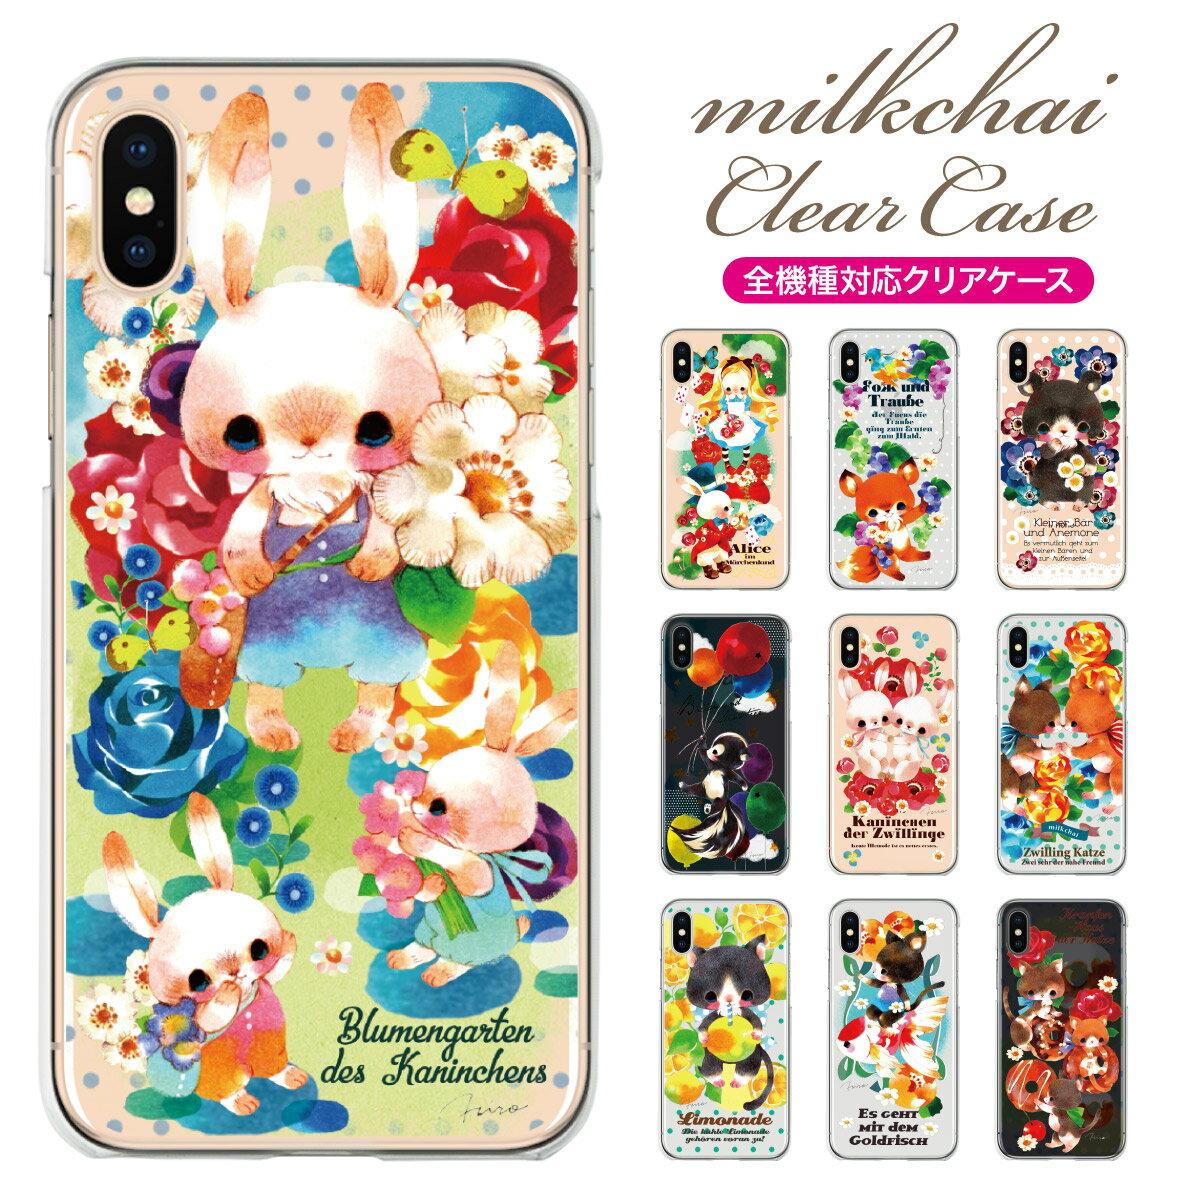 iPhone7ケース iPhone7 iPhone6s iPhone6 Plus iphone SE 全機種対応ケース スマホケース ハードケース カバー クリアケース Xperia AQUOS GALAXY arrows milkchai 30-zen-ca001-cp